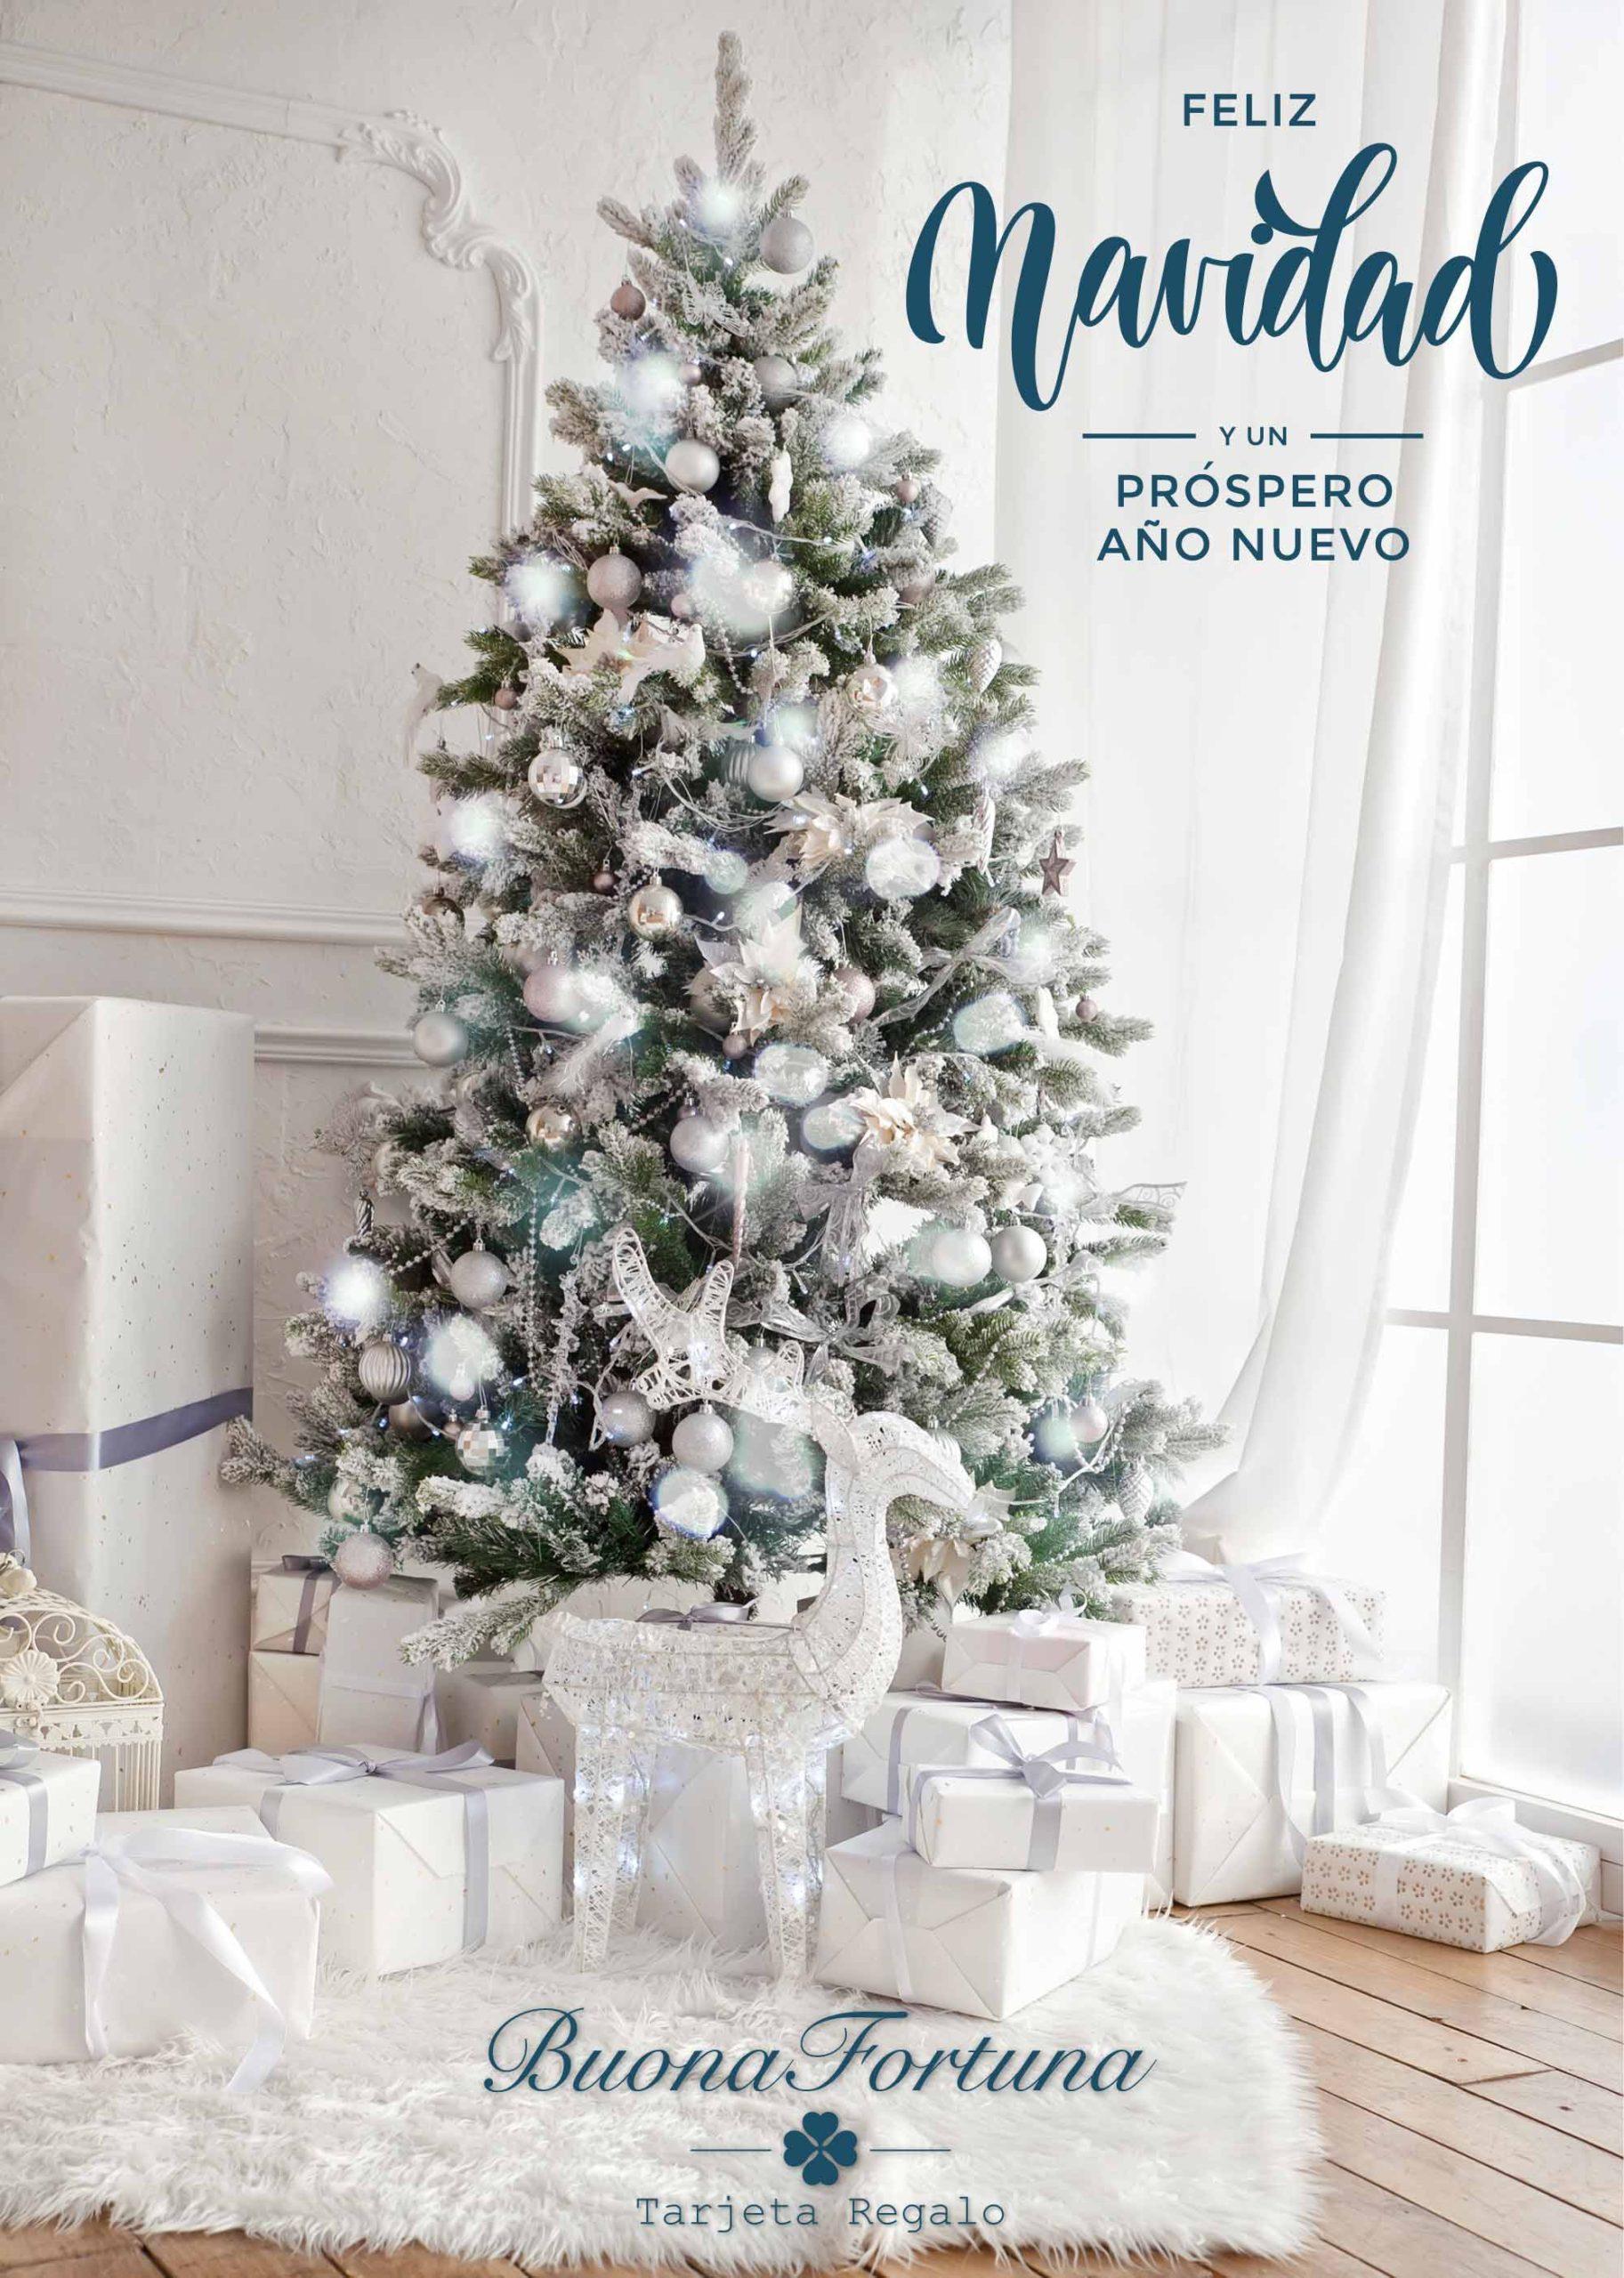 tarjeta regalo feliz navidad buona fortuna